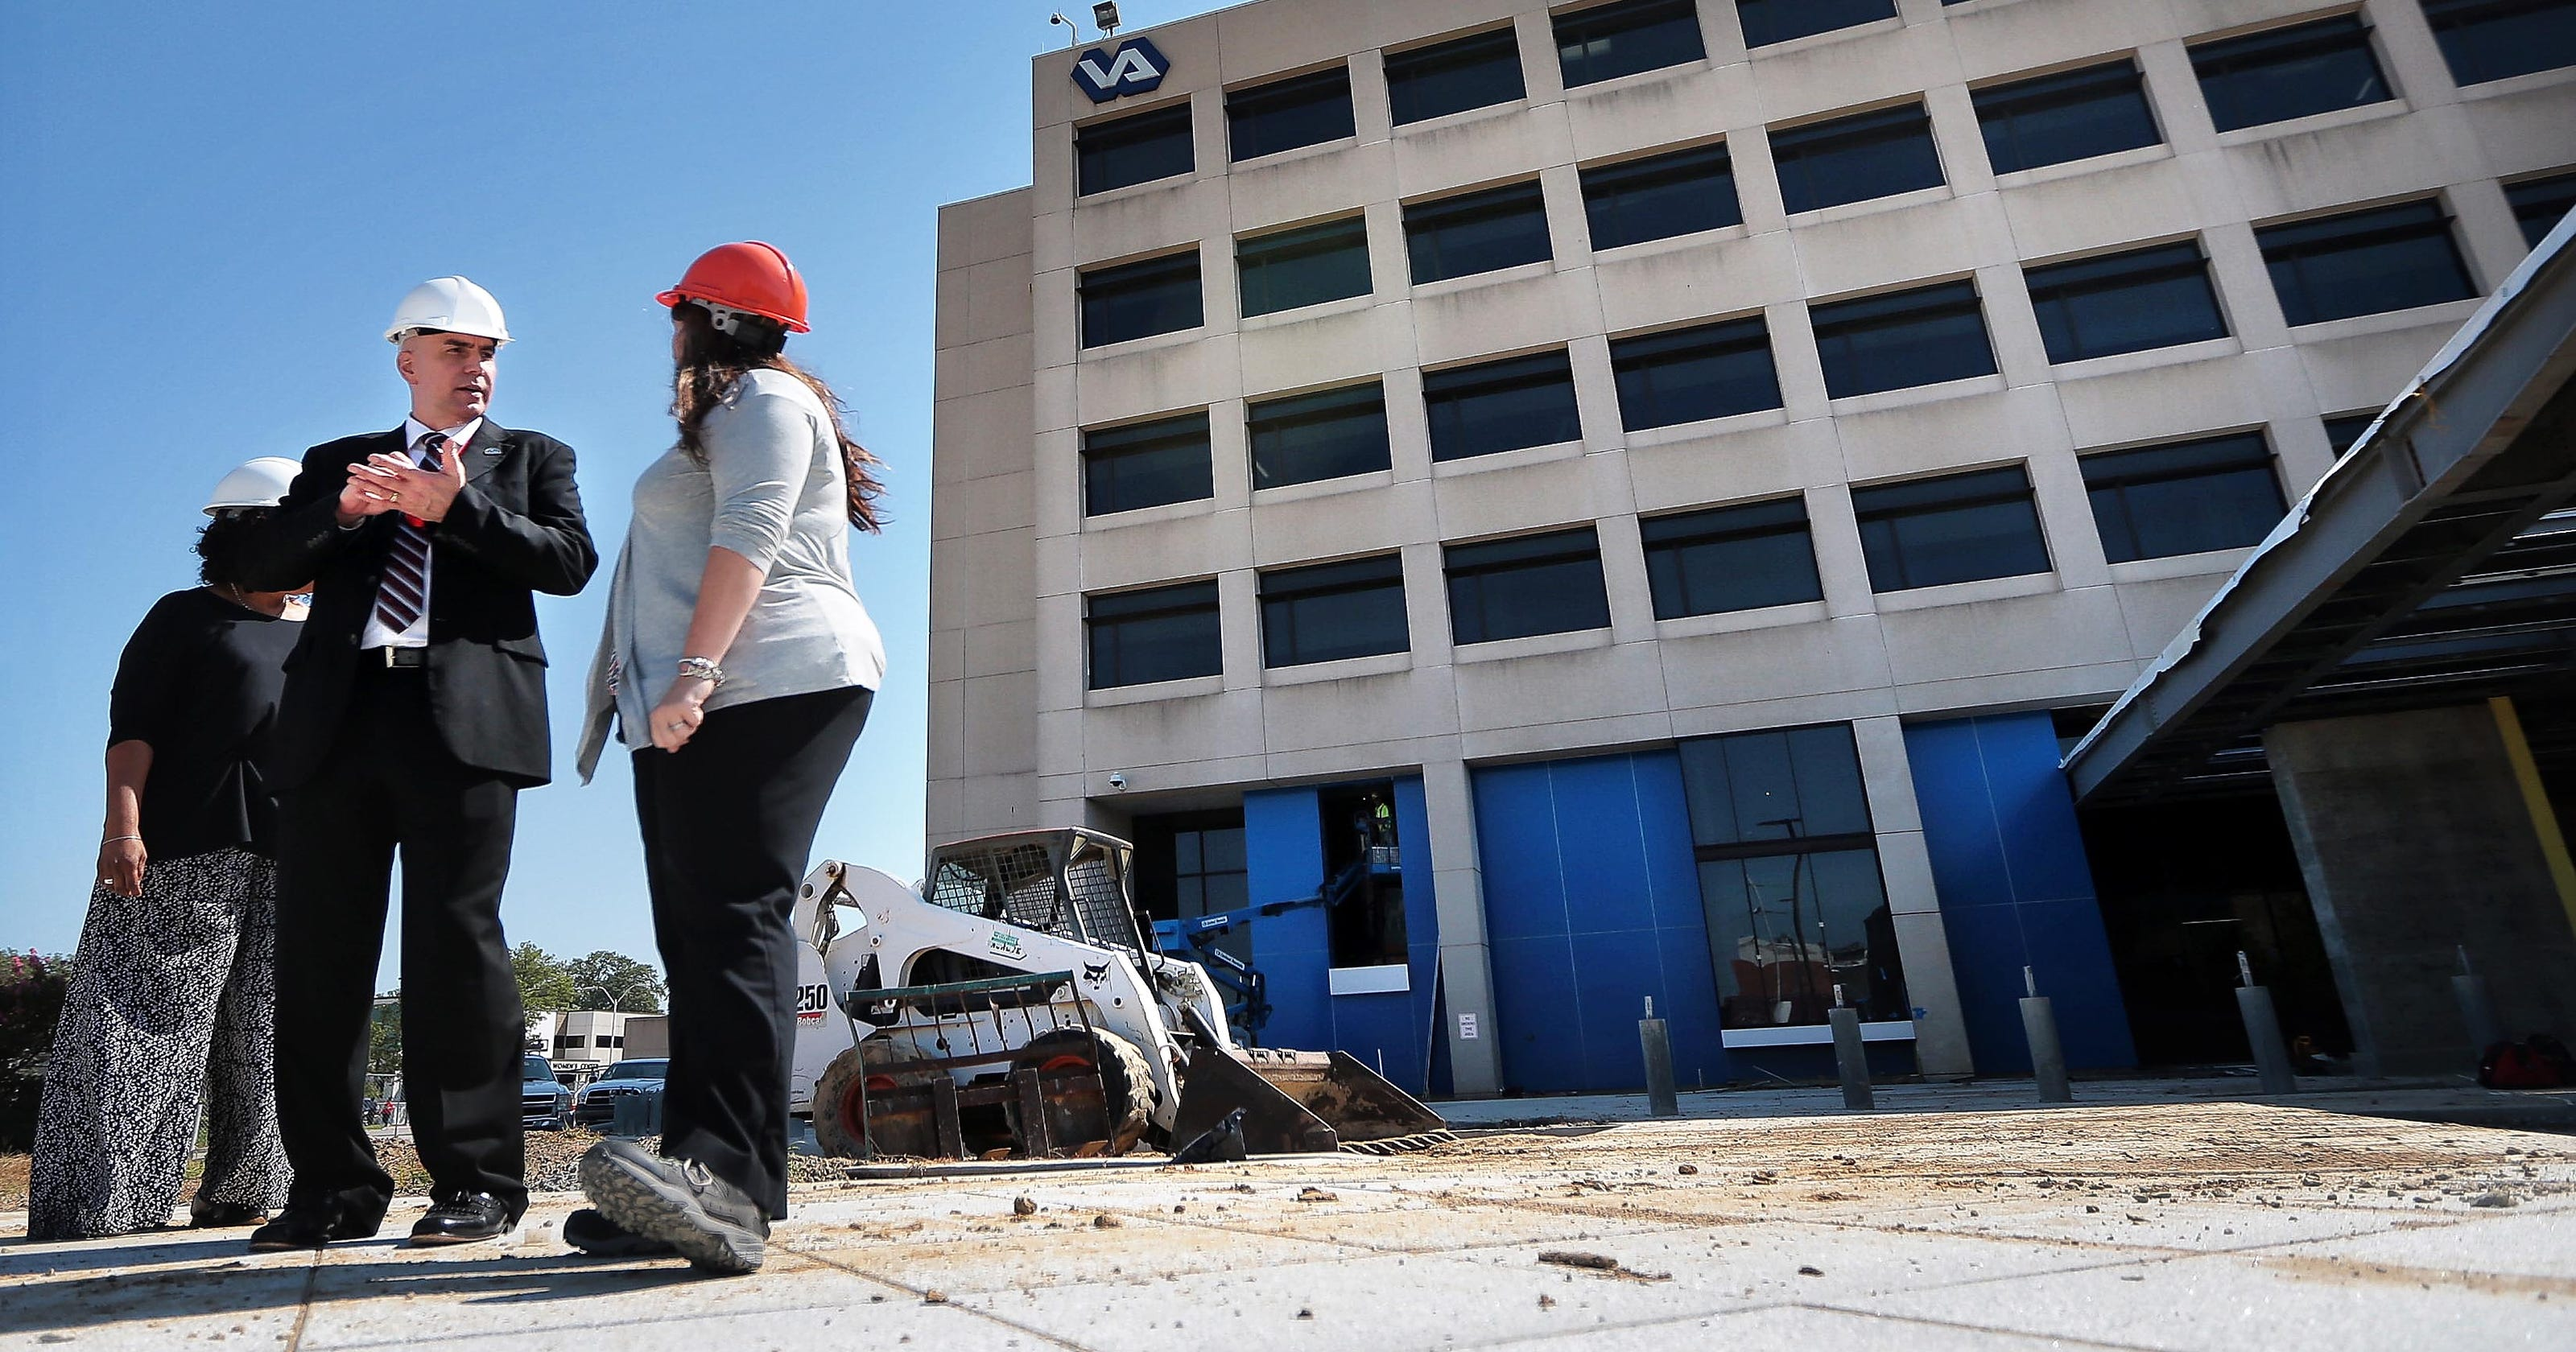 Va Topeka Ks >> Memphis Va Hospital Among 4 Under Tight Watch From Agency Officials